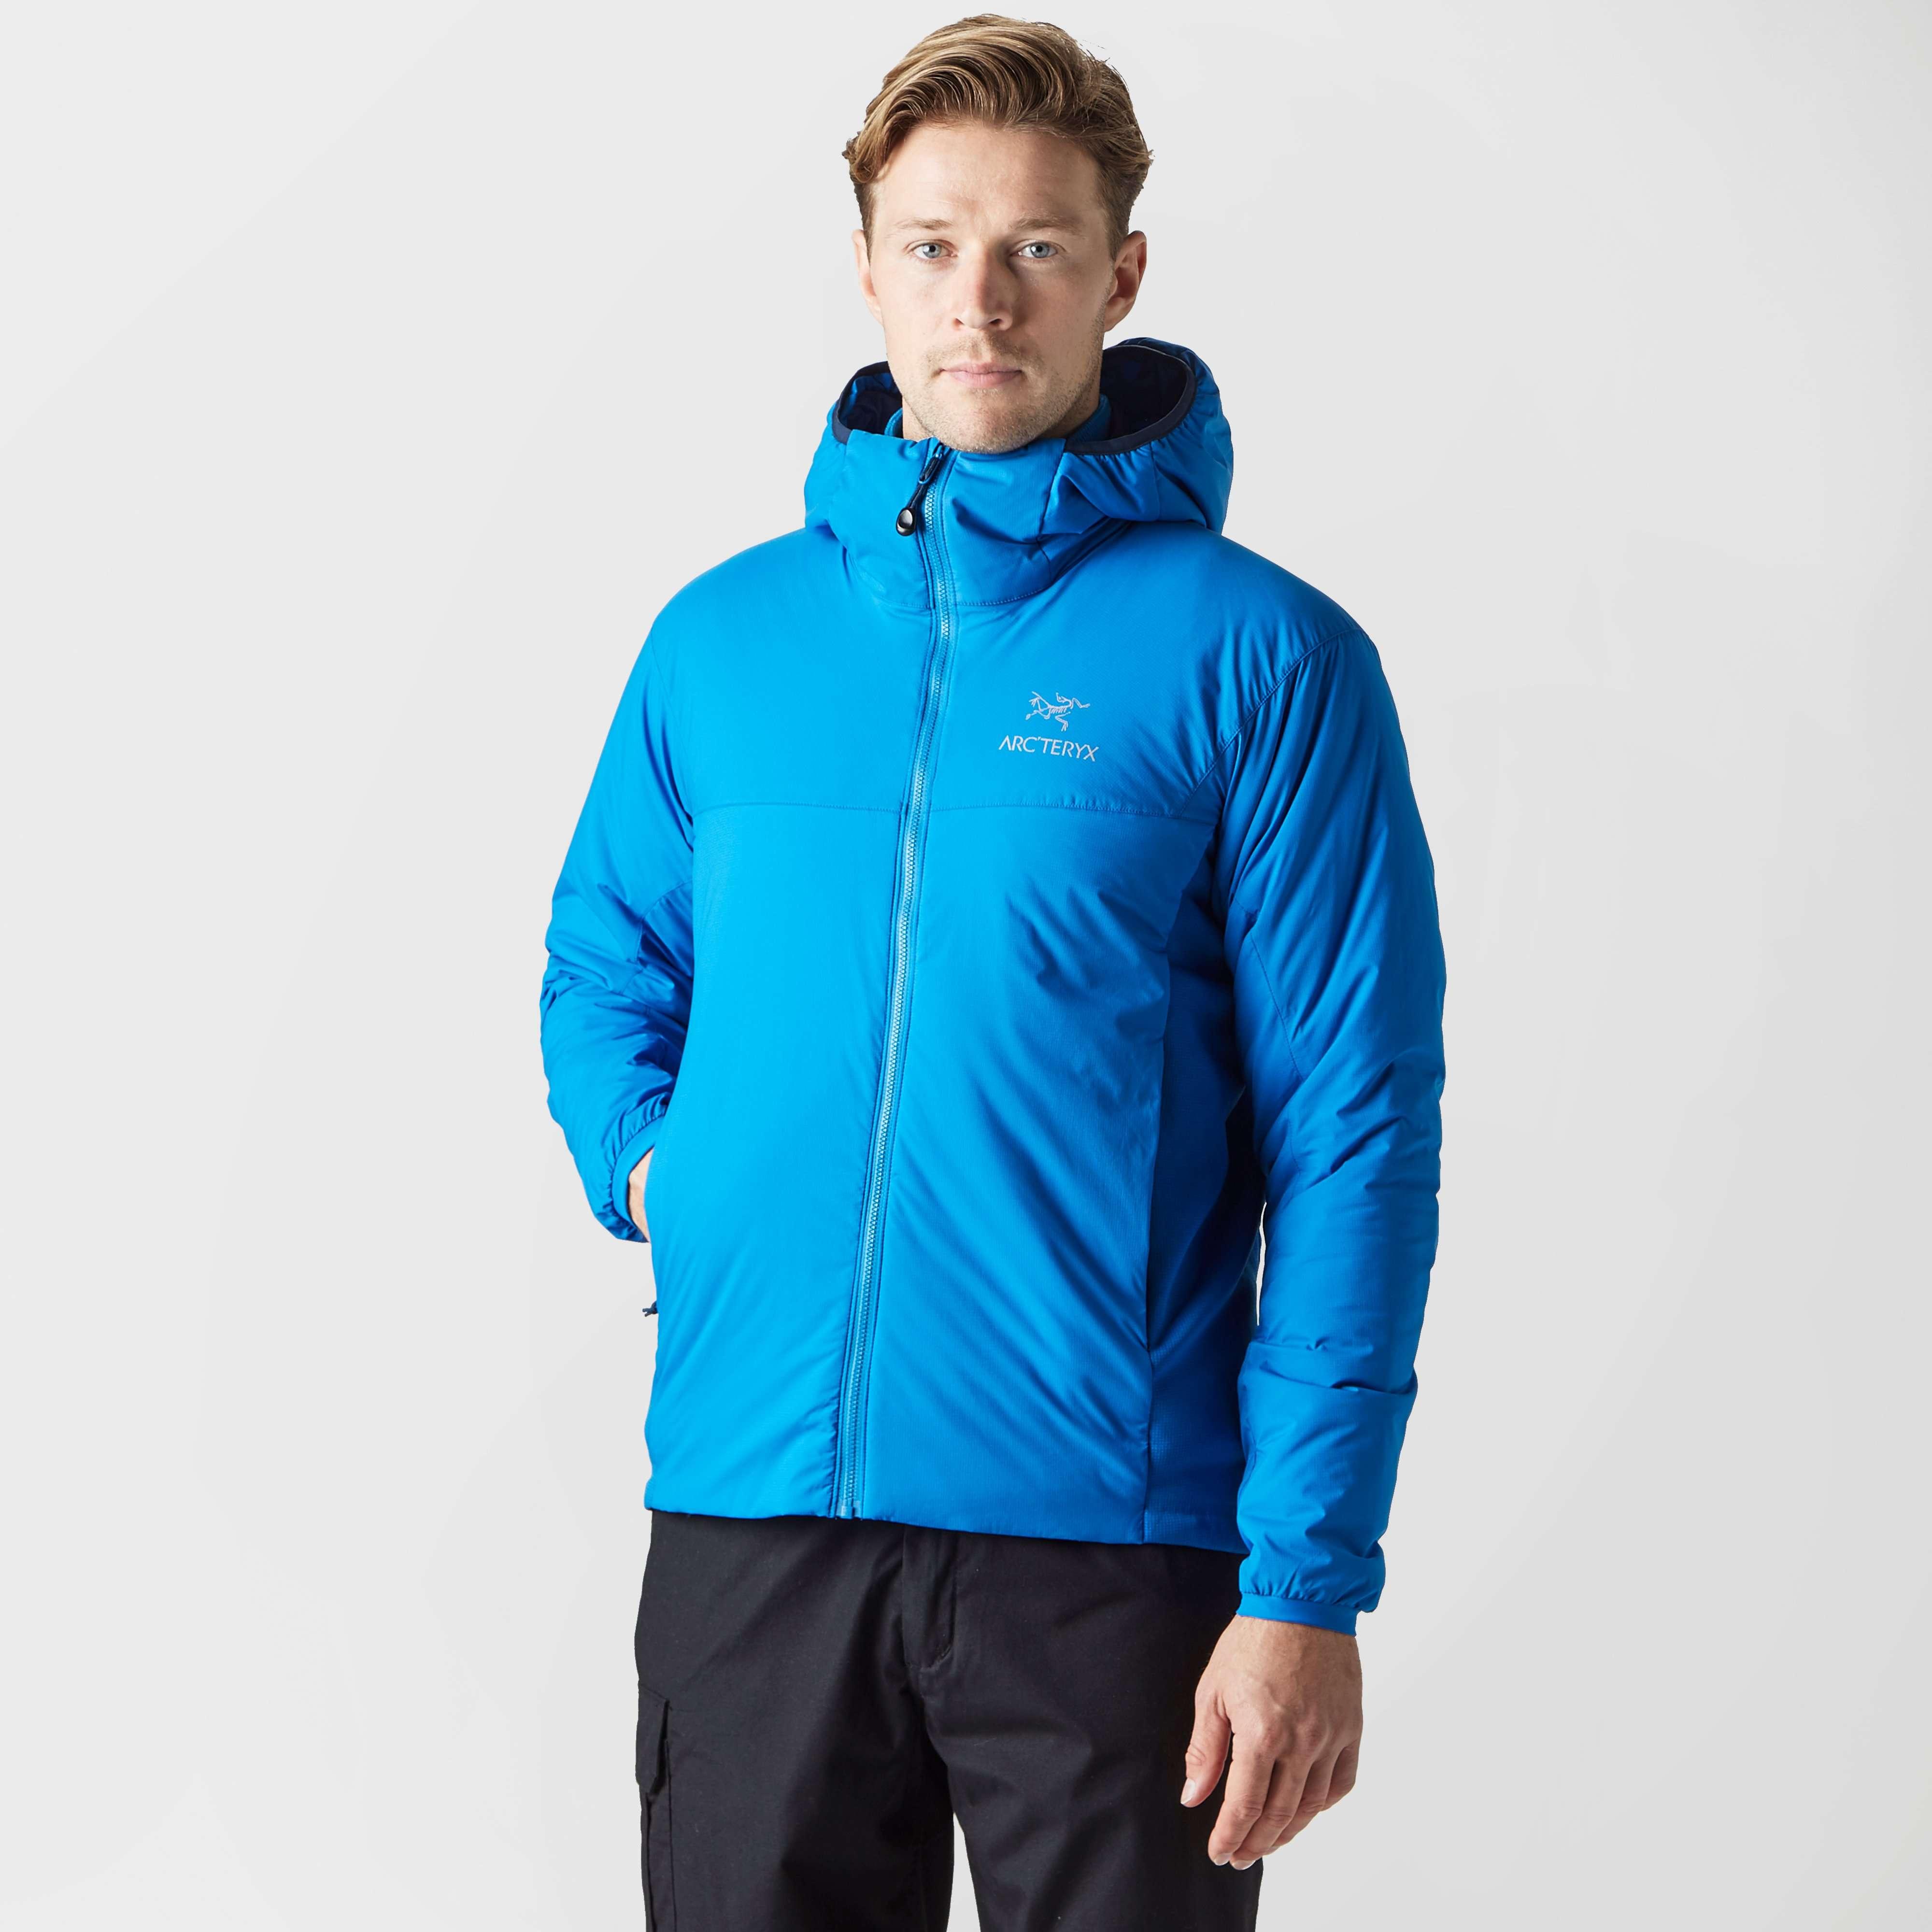 ARC'TERYX Men's Atom LT Insulated Jacket